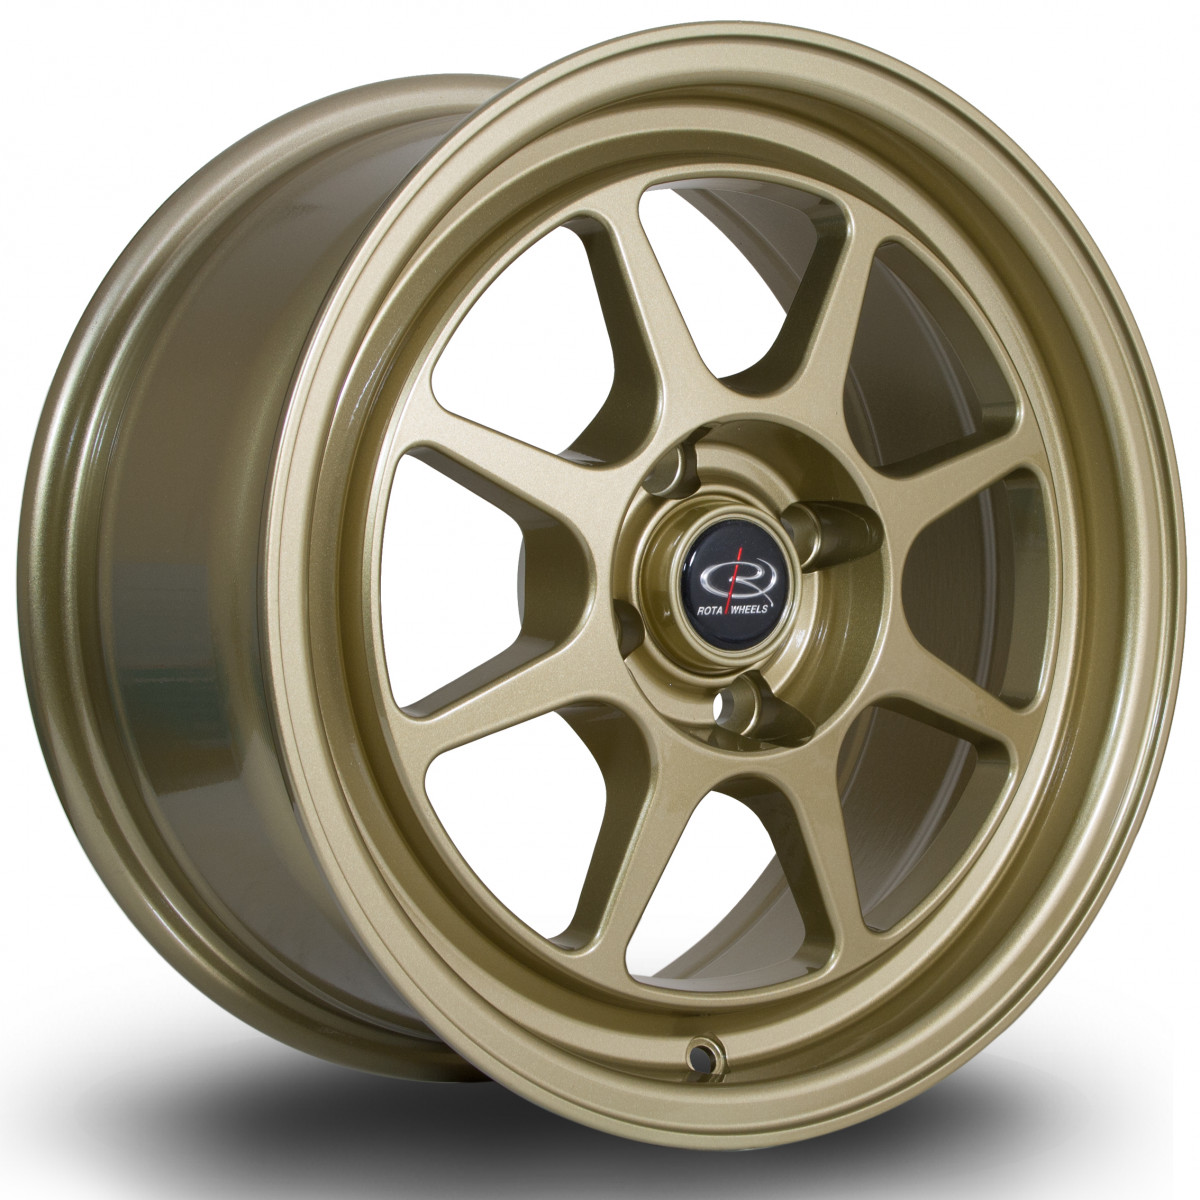 Spec8 15x7 4x100 ET35 Gold